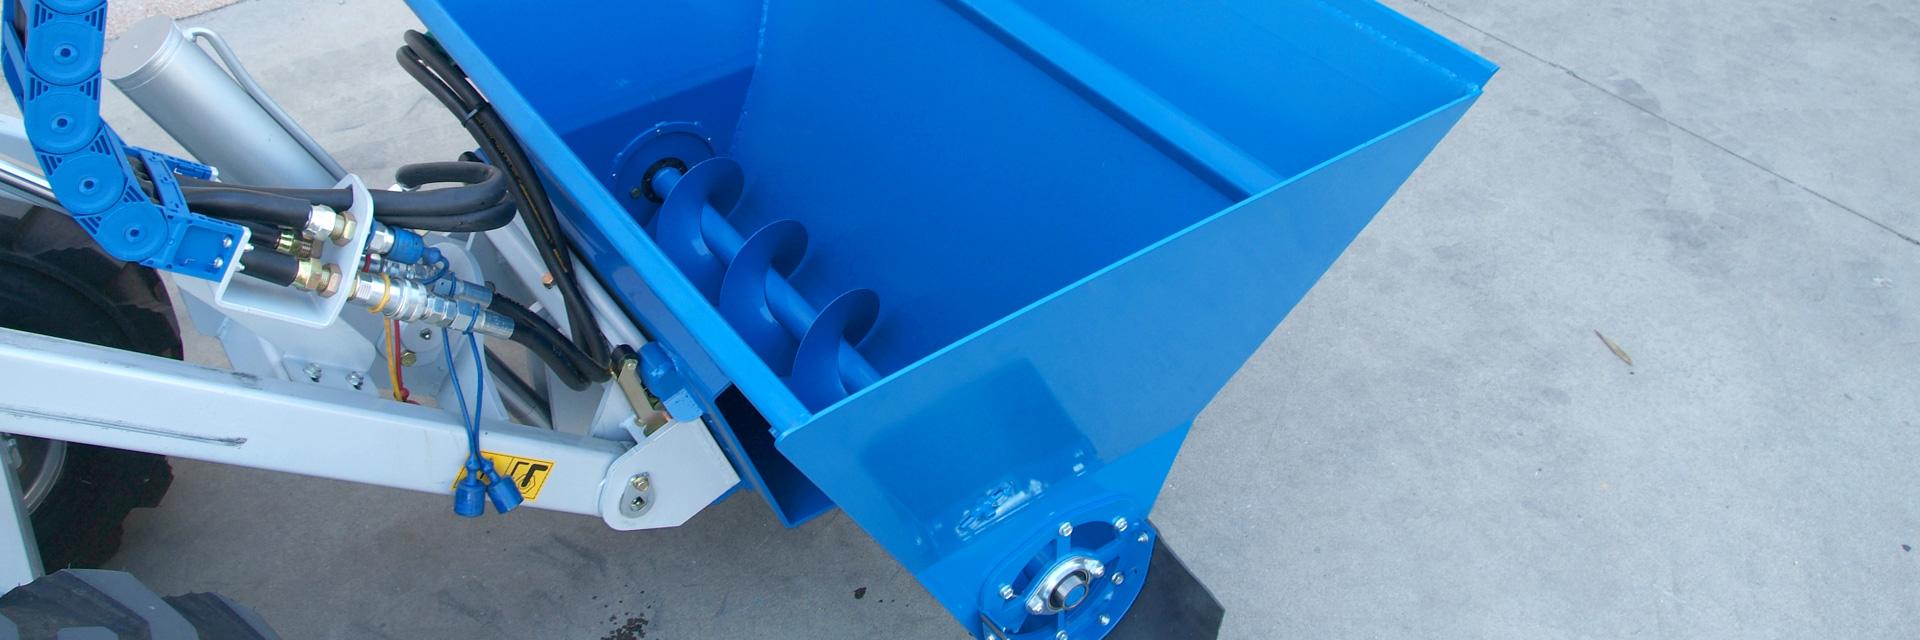 Multione-feed-dispenser for mini loaders